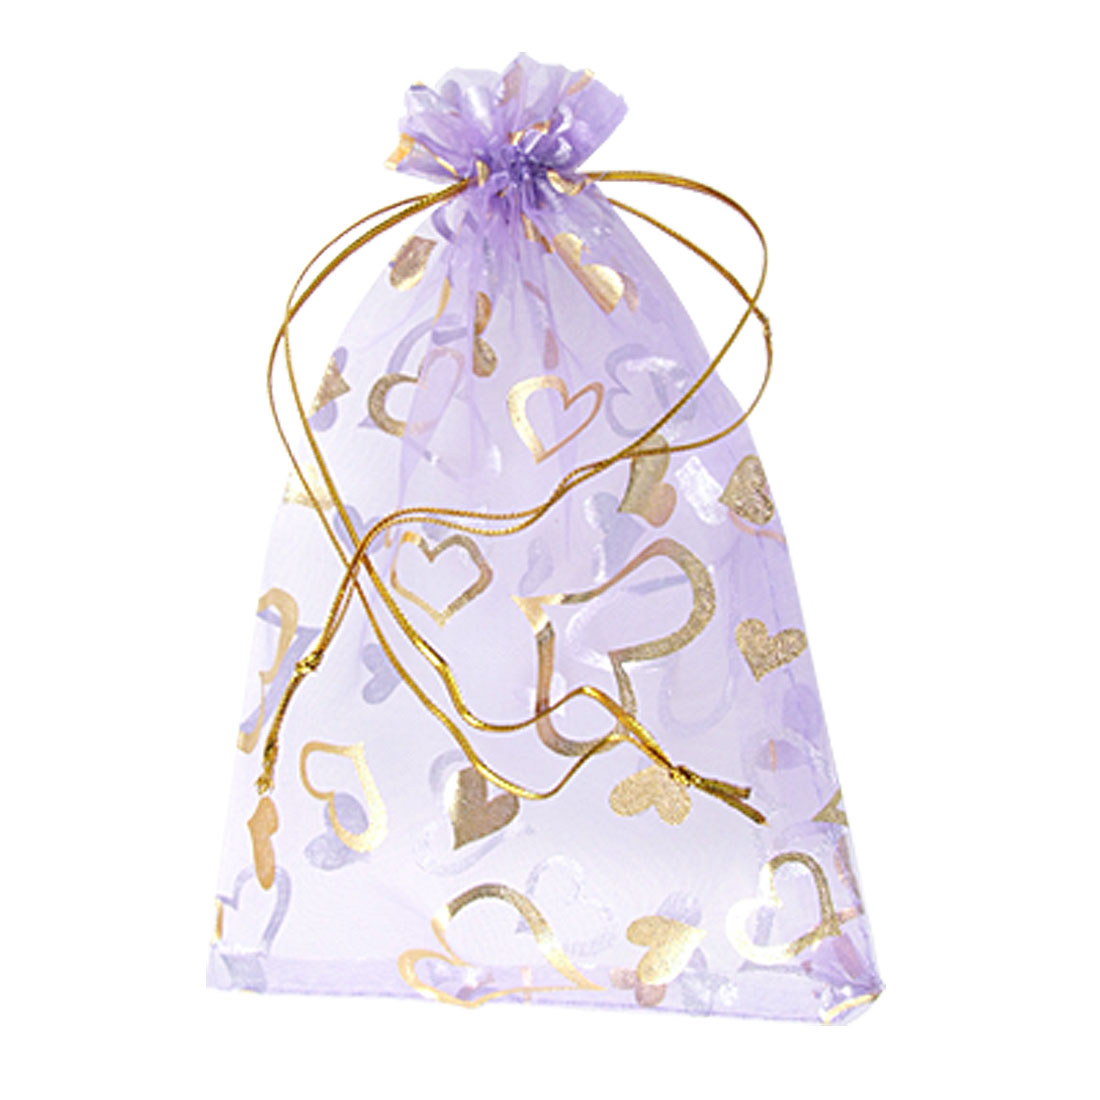 5 Pcs Heart Pattern Wedding Gift Bag Organza Pouch Lavender